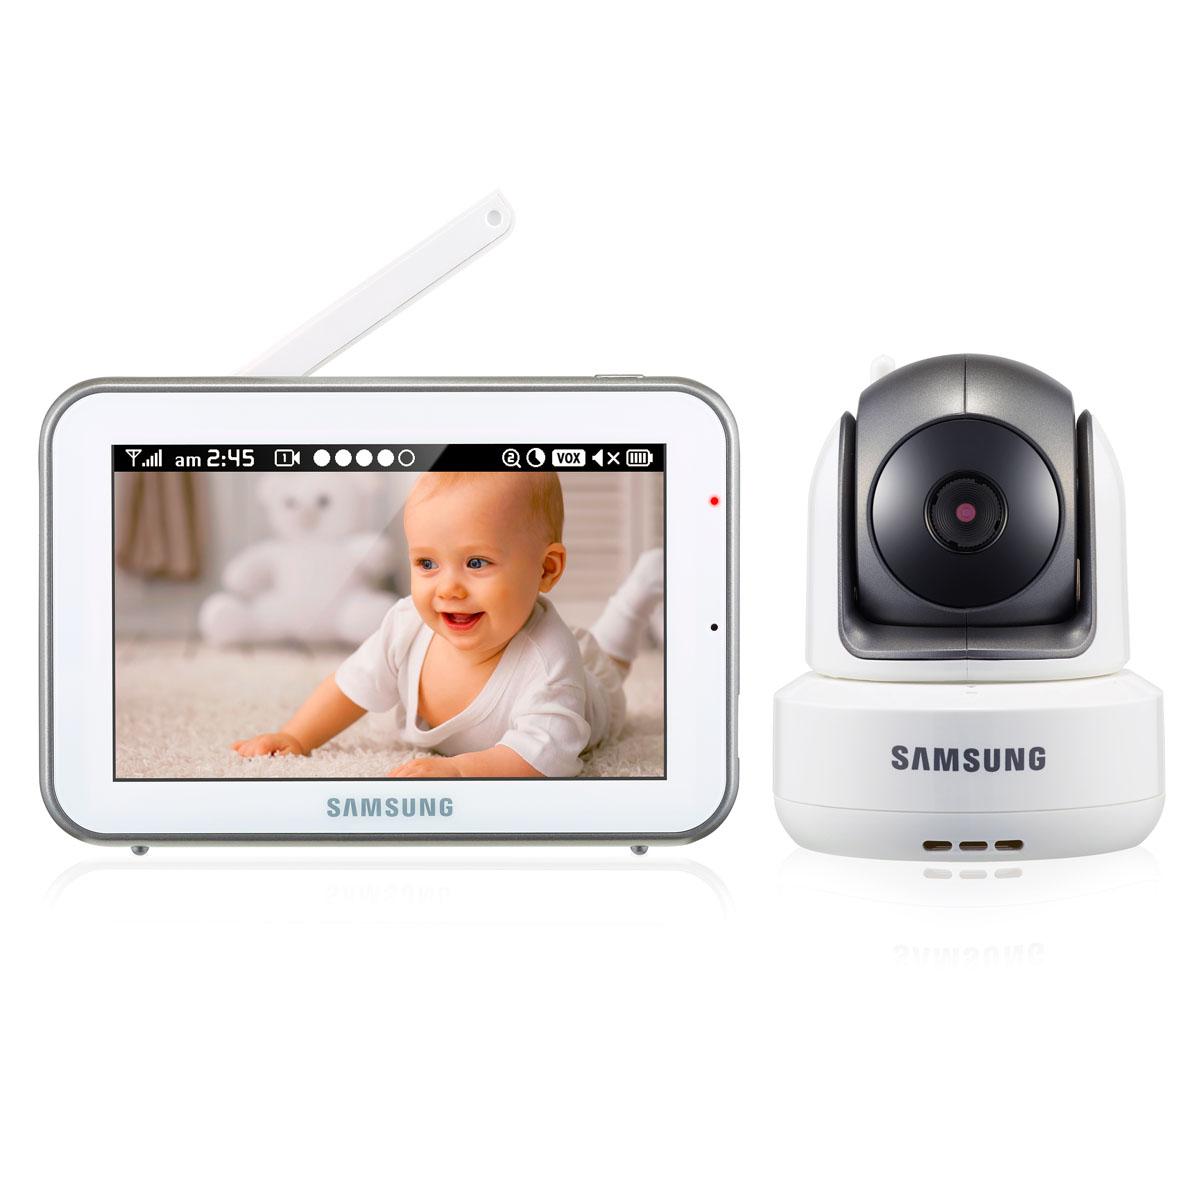 Samsung Видеоняня SEW-3043WP -  Радио и видеоняни